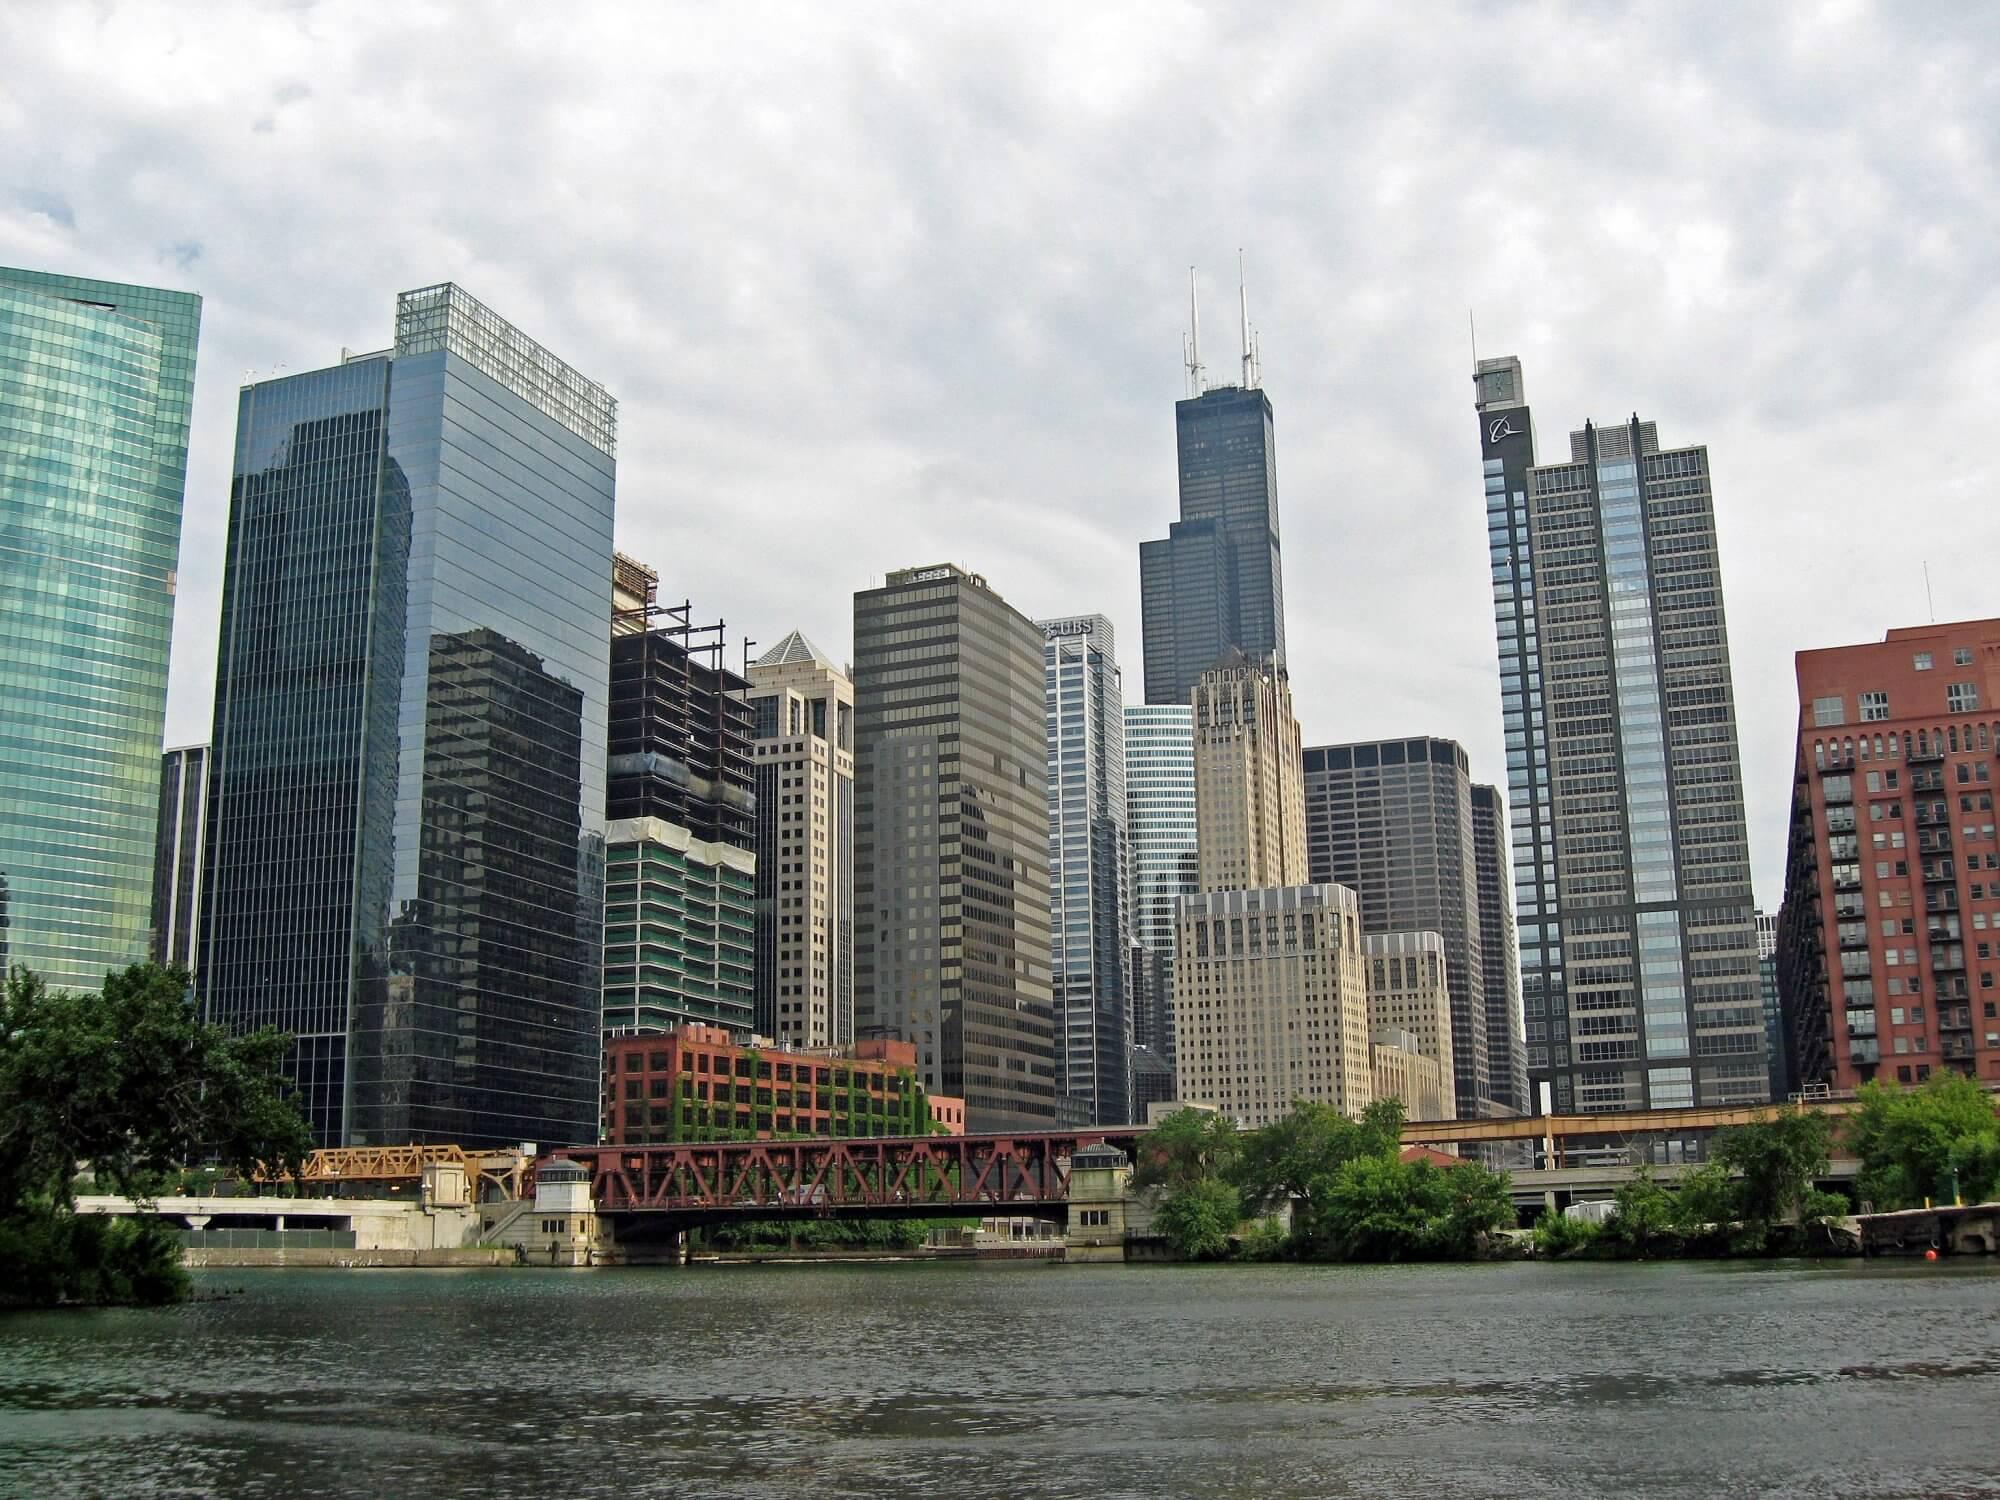 Chicago Area Waterway System Habitat Evaluation & Improvement Study